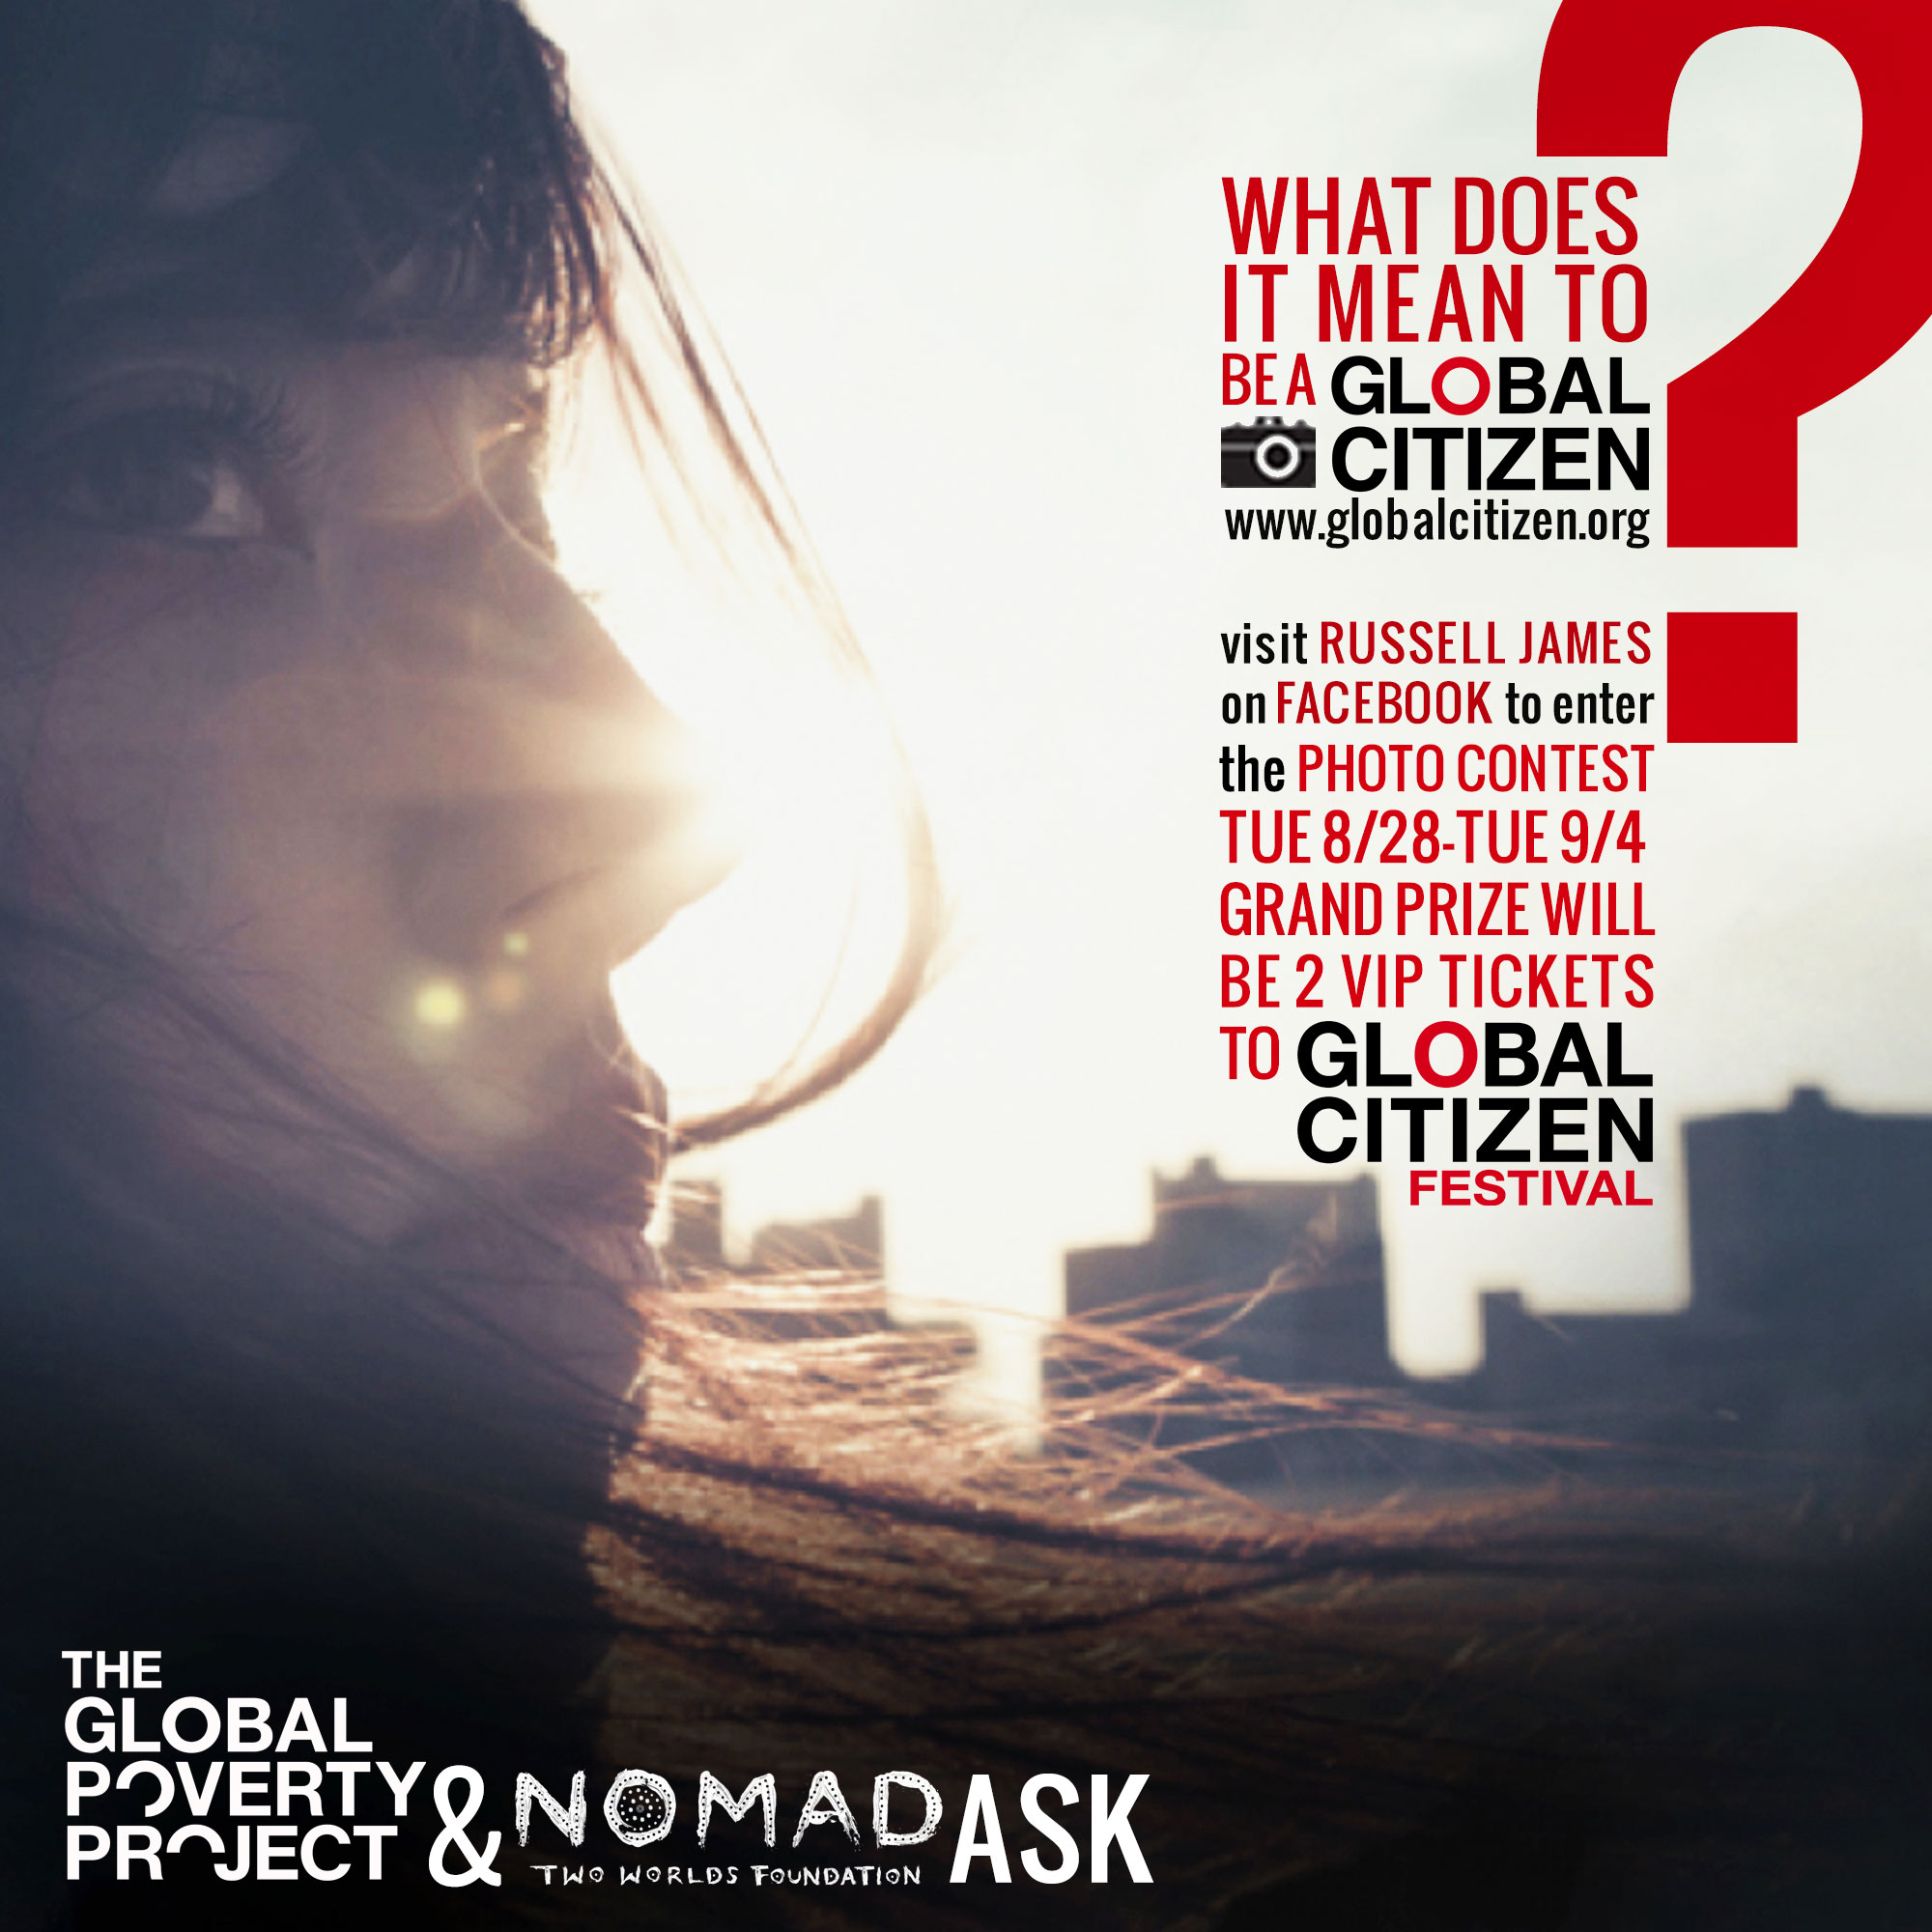 GLOBAL CITIZEN FESTIVAL// SOCIAL IMAGES